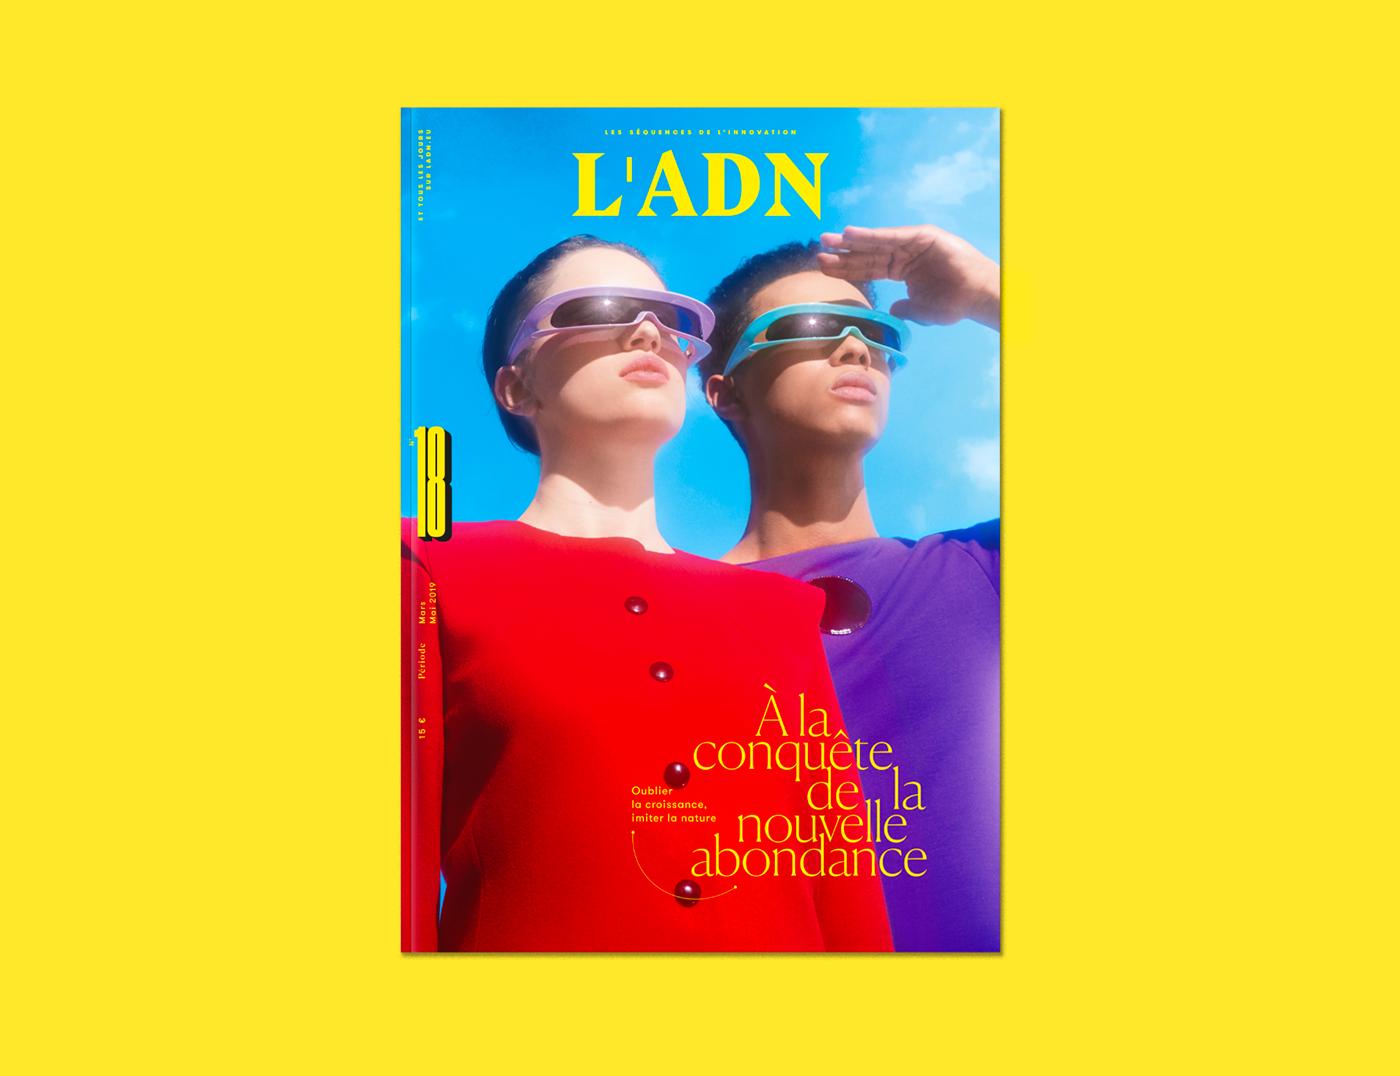 L'adn editorial grid Layout Violaine&jeremy Julia&vincent vincent girardot peter singer type magazine